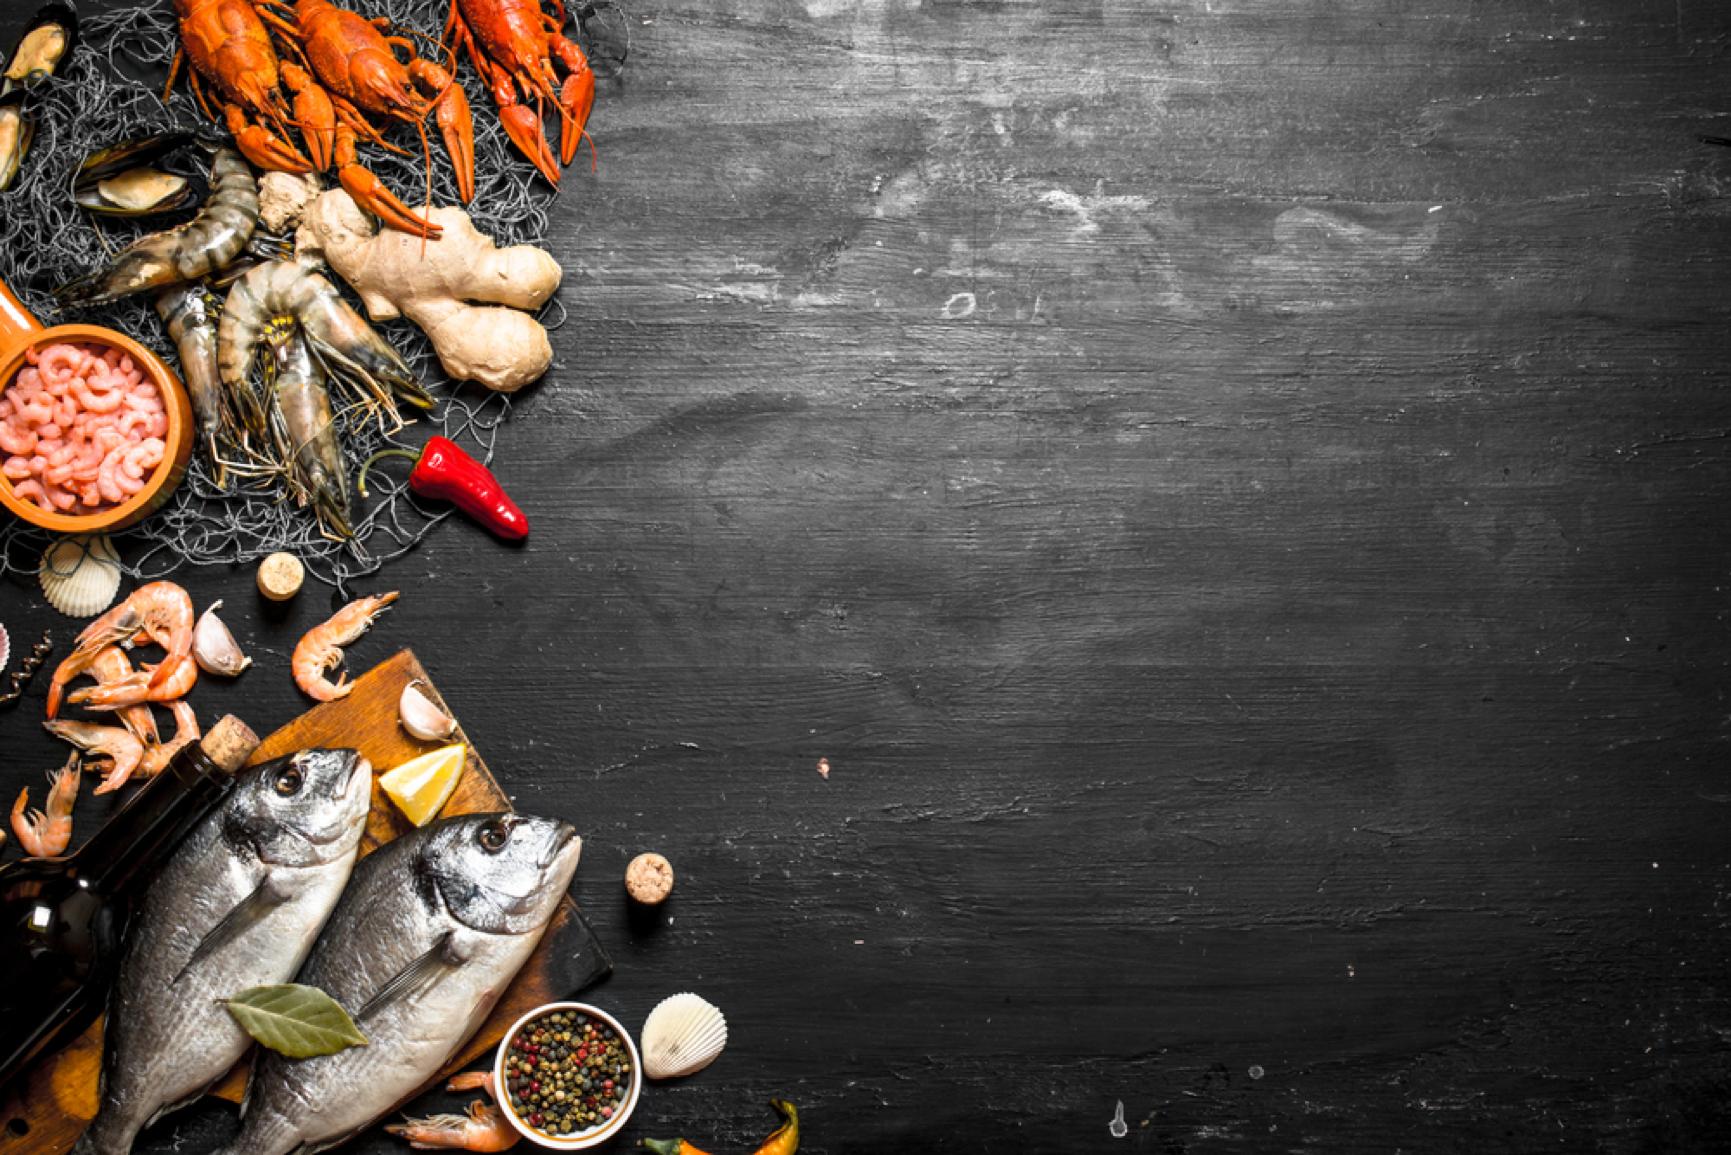 Diforti fresh fish and Italian produce.